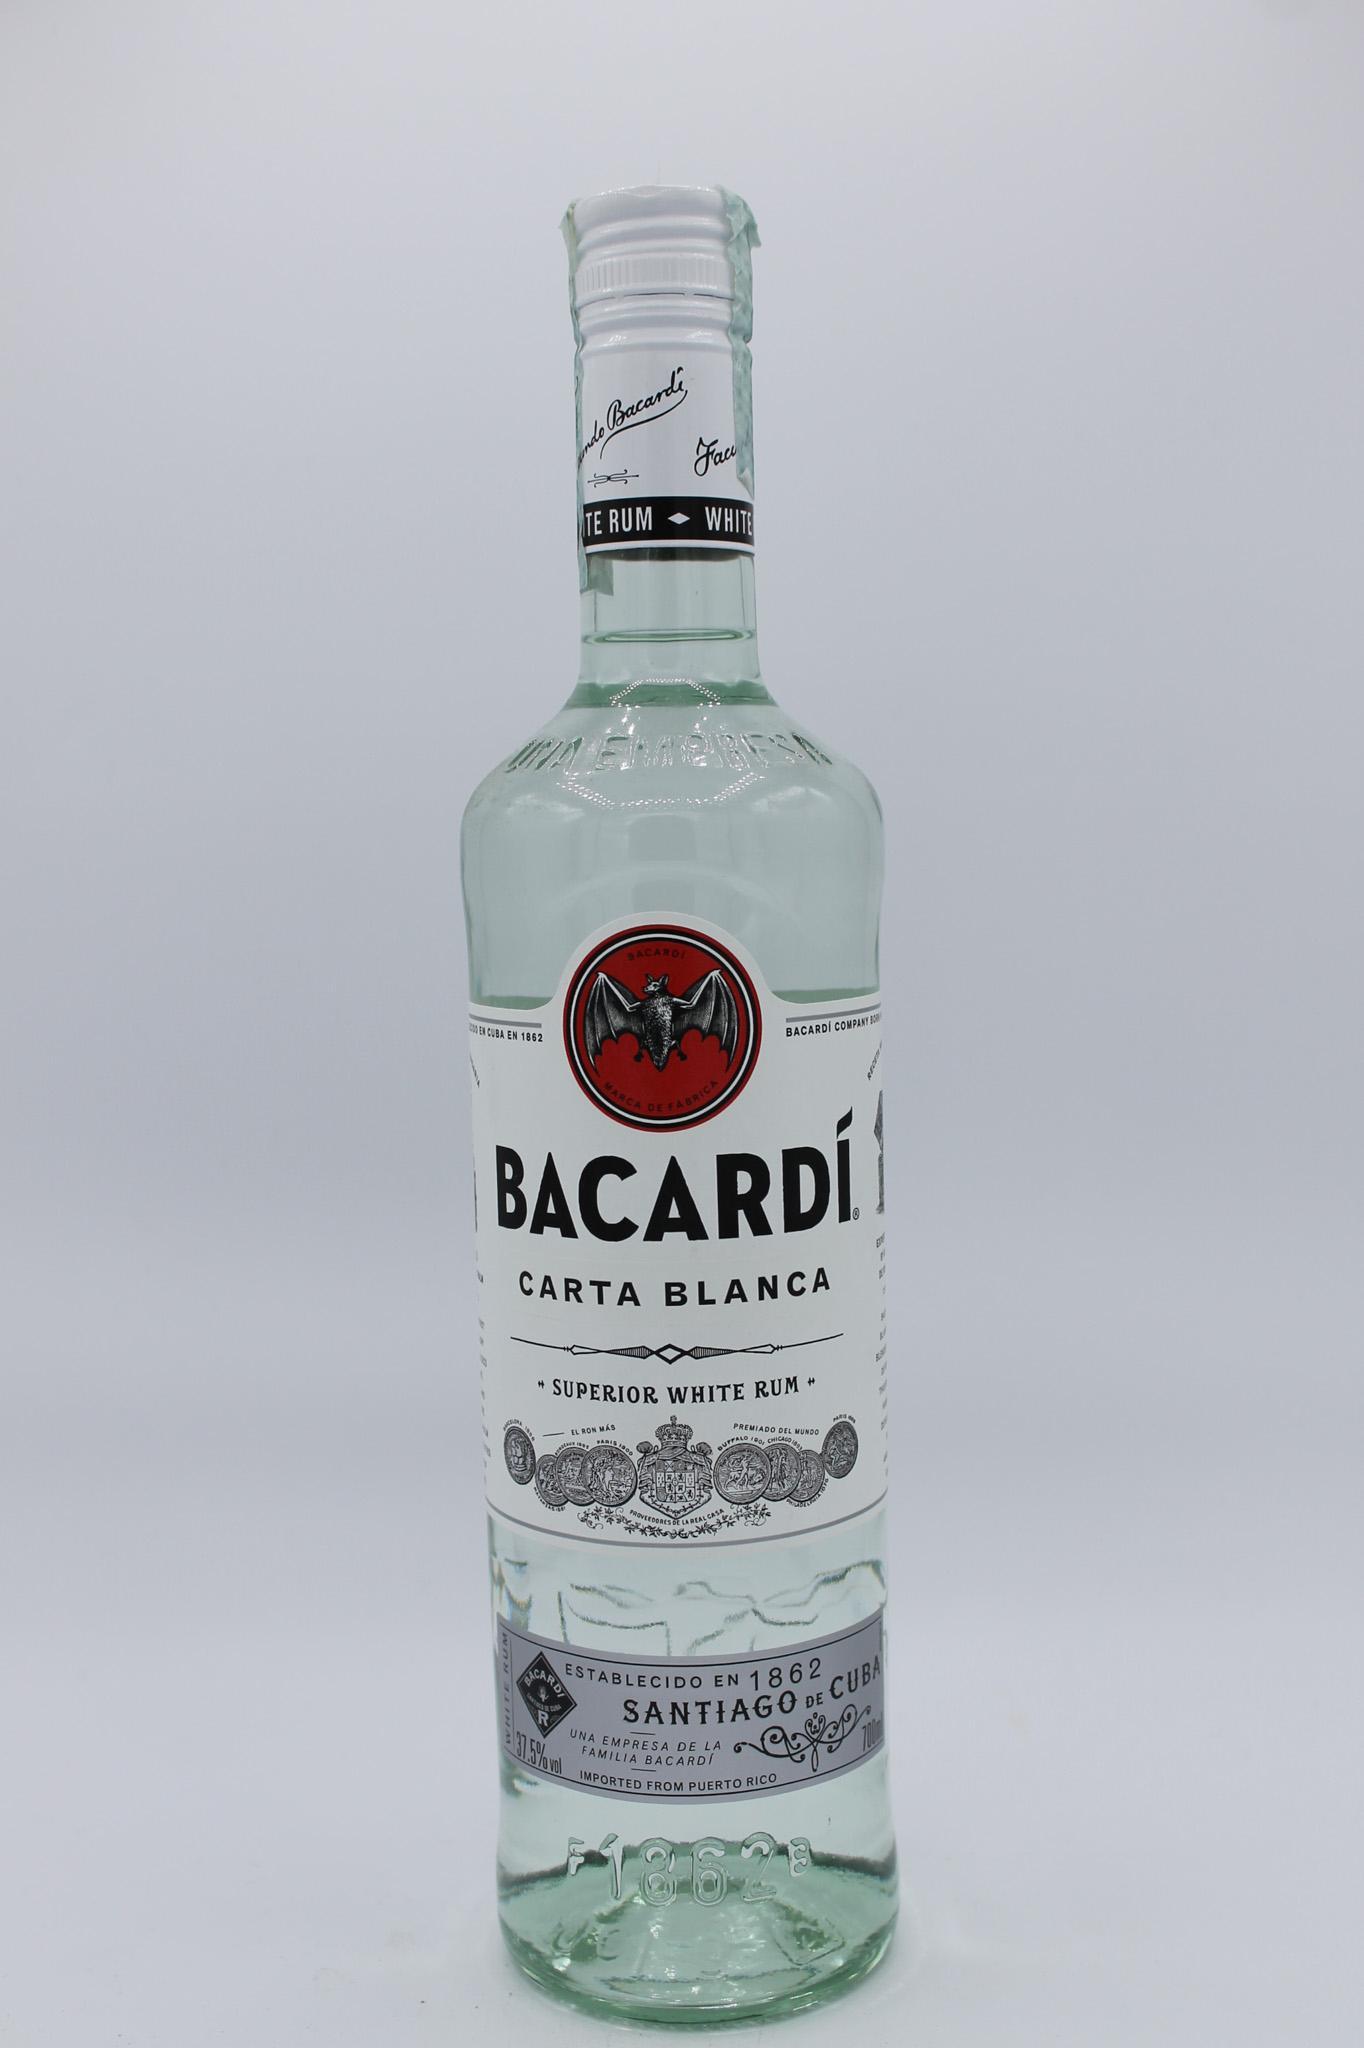 Bacardi rum carta blanca 700ml.